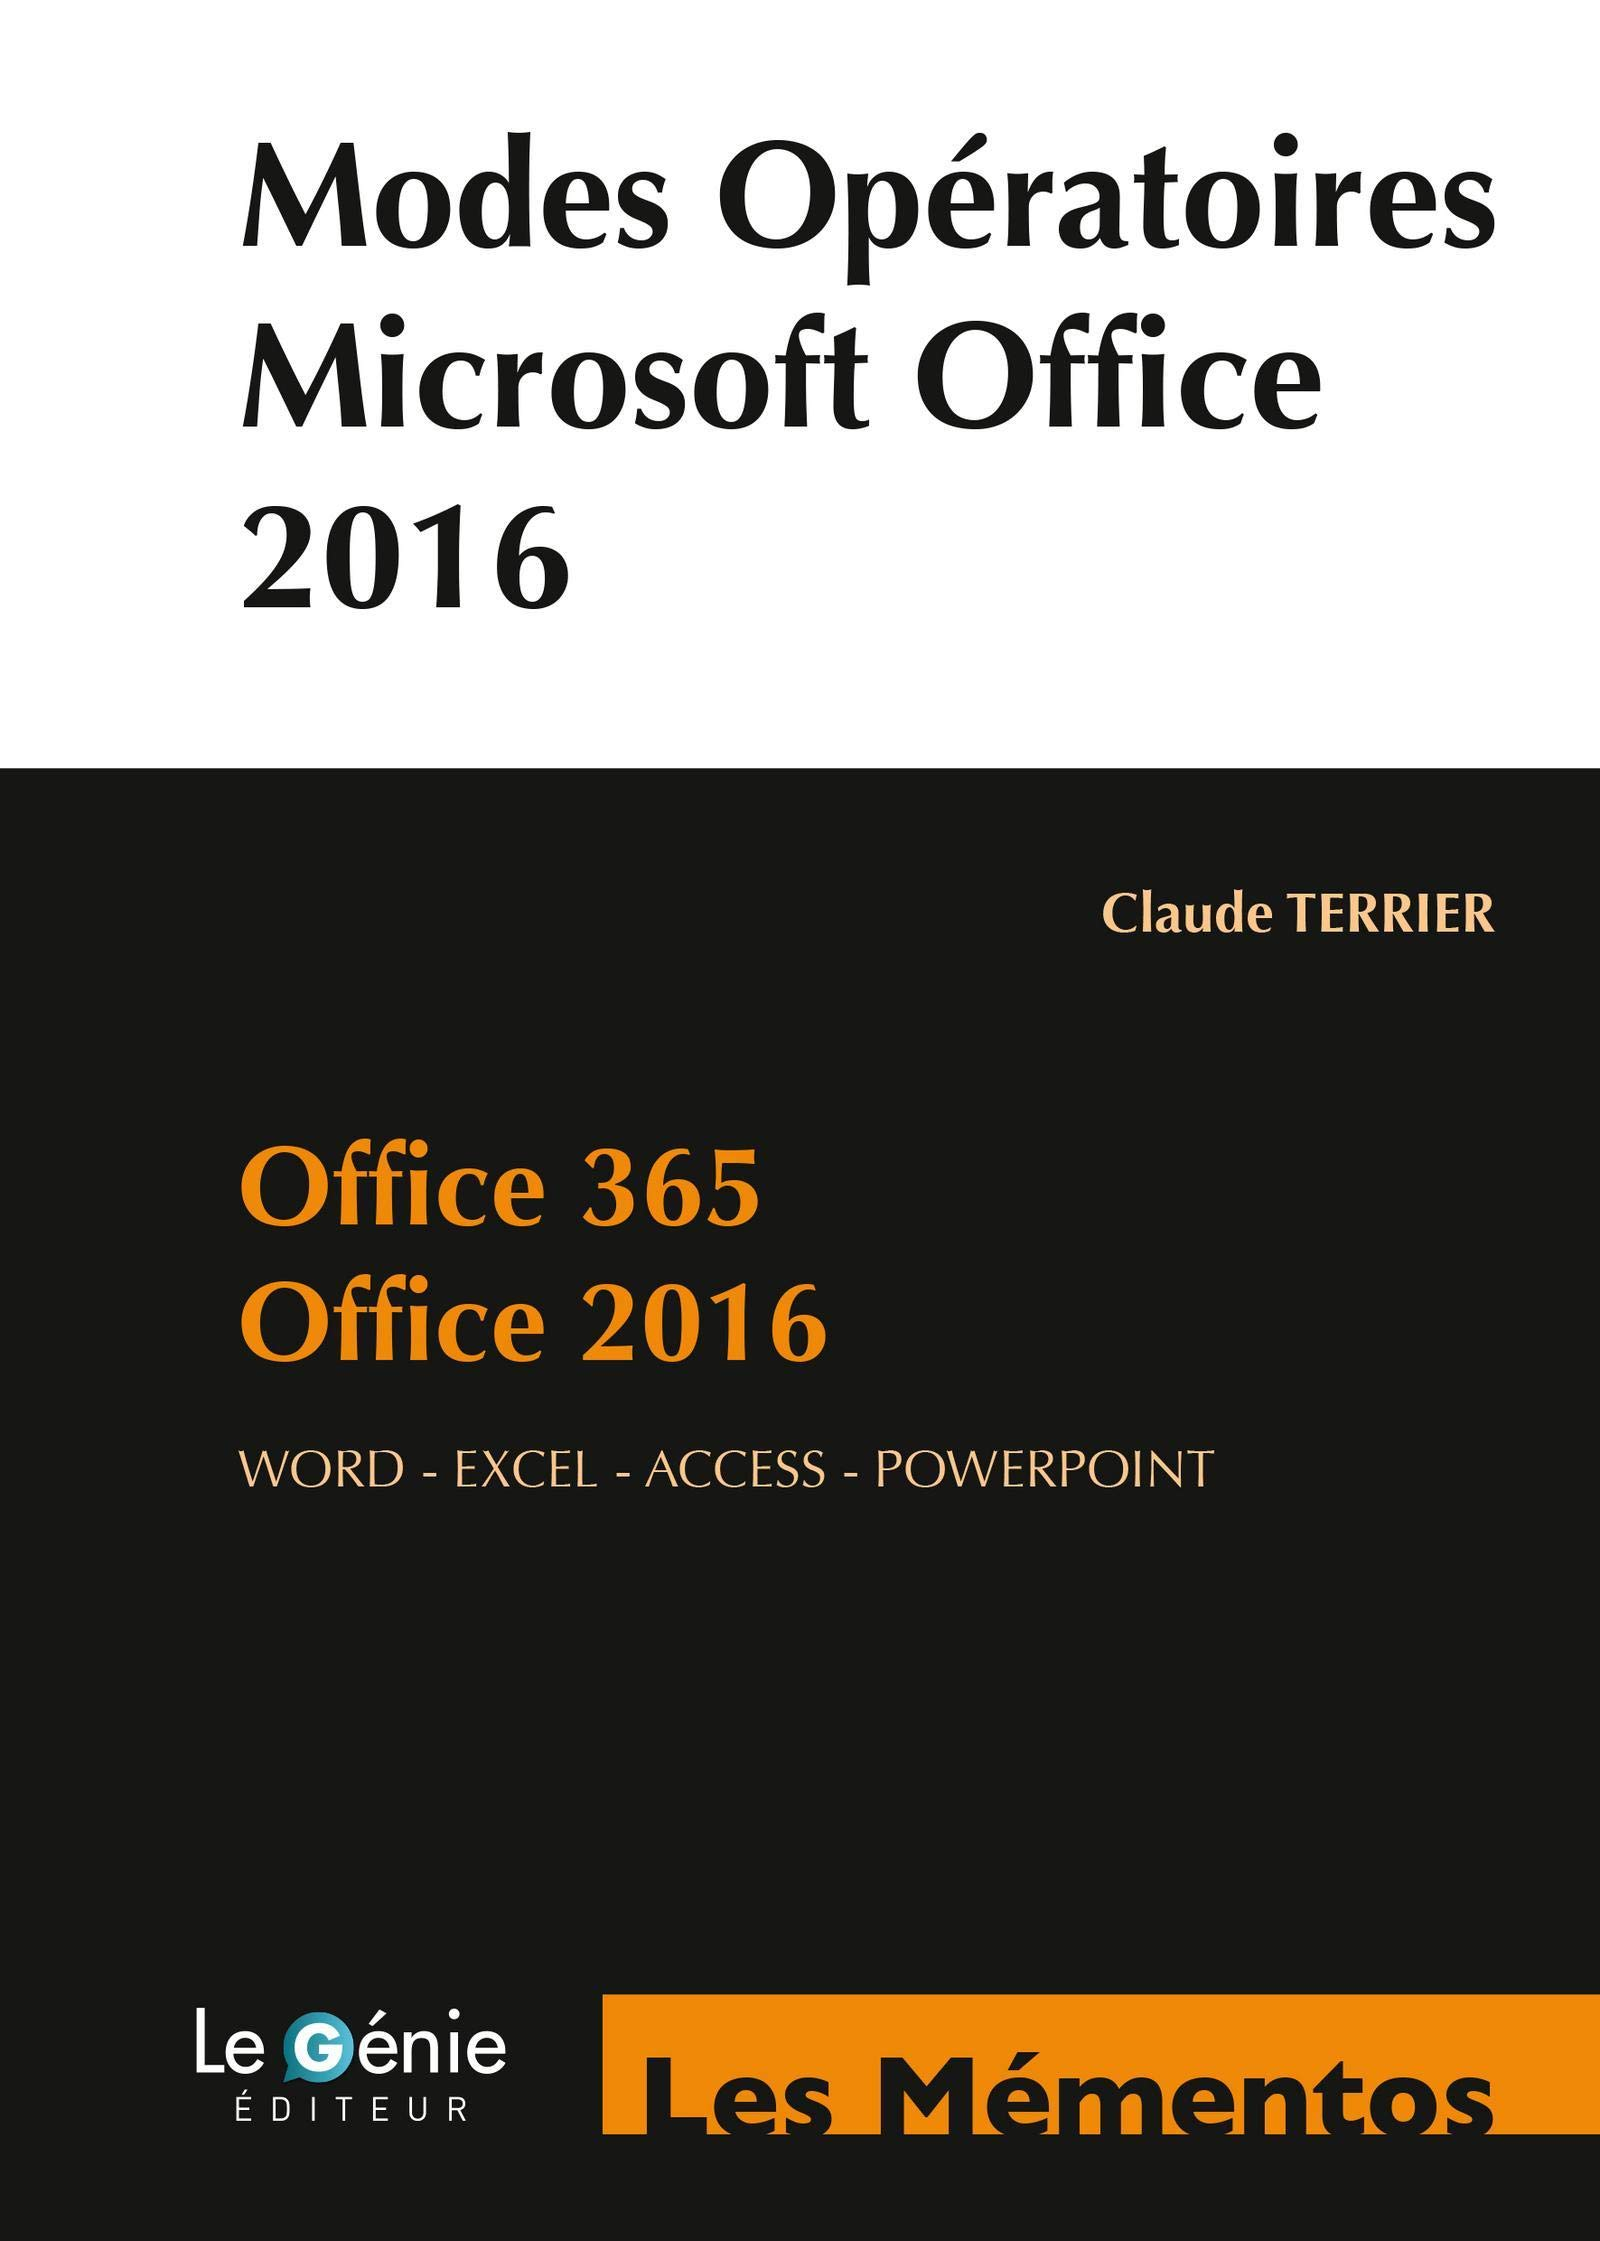 Modes operatoires Microsoft office - office 365 - office 2016. word - excel - access - powerpoint. Les Mémentos: Amazon.es: Terrier, Claude: Libros en idiomas extranjeros